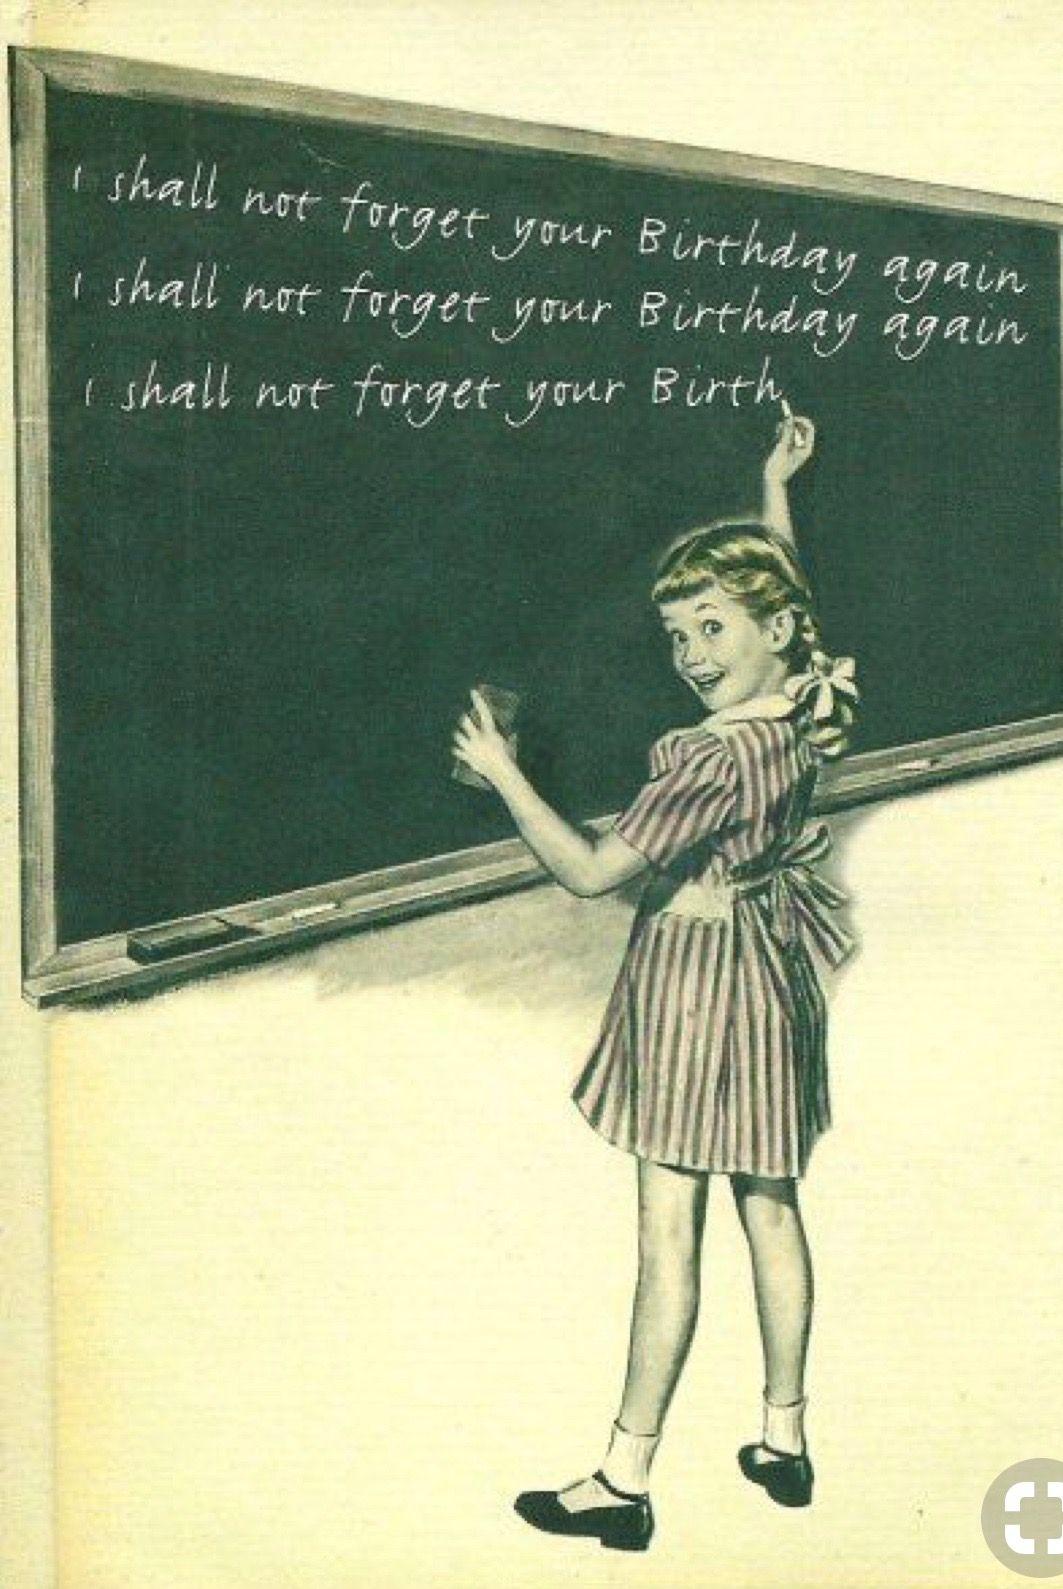 Pin By Zhanna Satska On Birthday Cards Birthday Wishes Funny Belated Birthday Wishes Happy Birthday Greetings